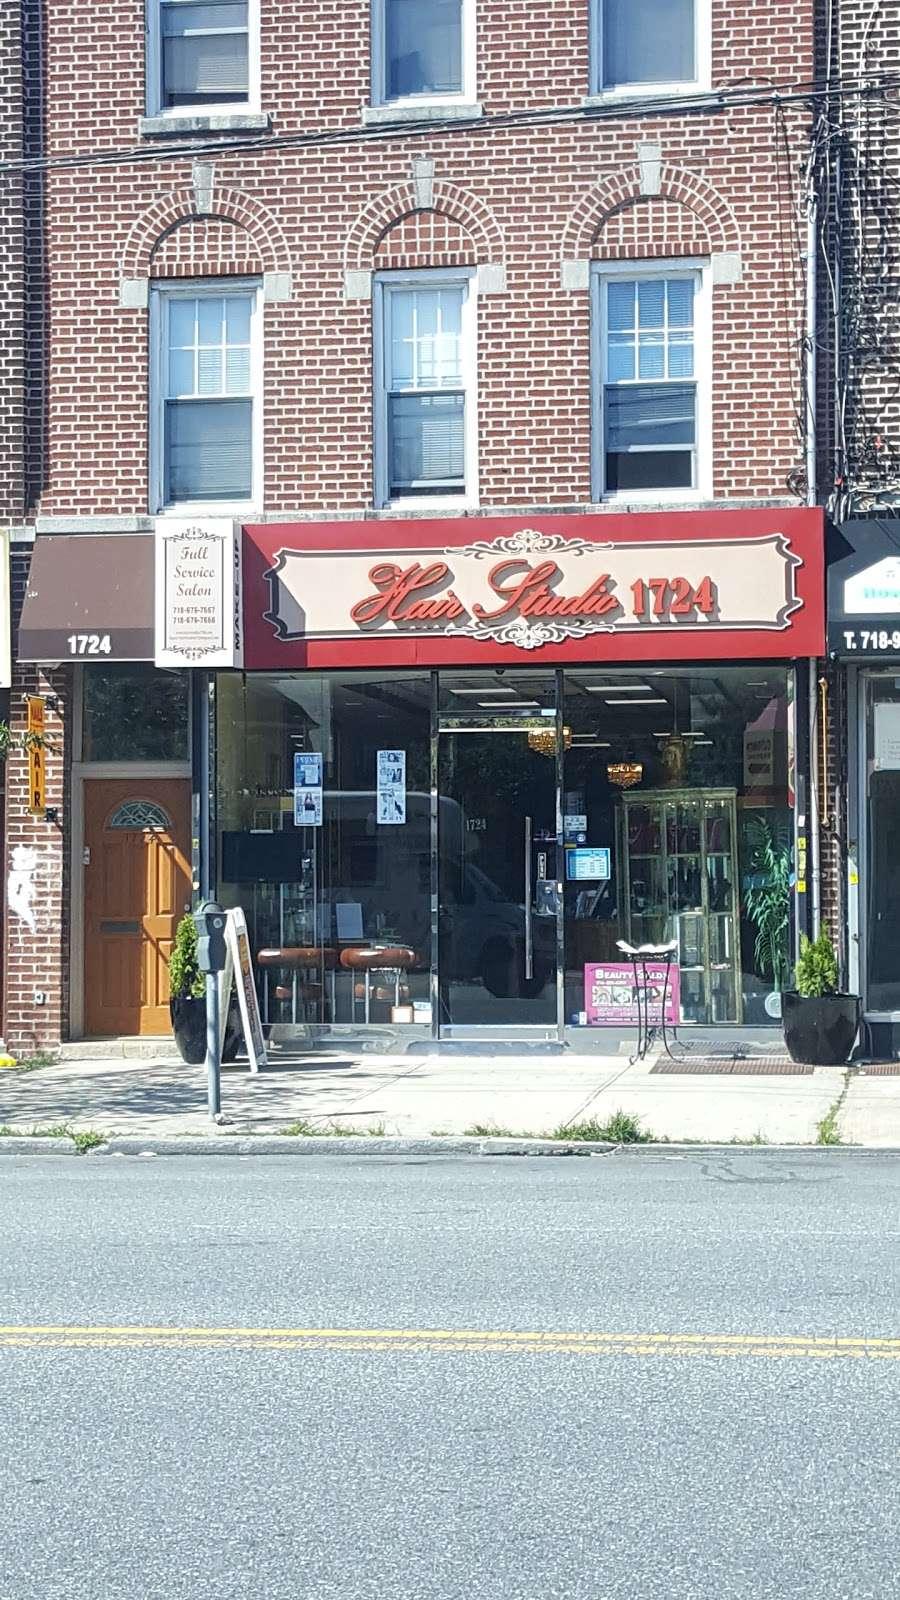 HairStudio1724 Salon & Day Spa - hair care  | Photo 4 of 10 | Address: 1724 Flatbush Ave, Brooklyn, NY 11210, USA | Phone: (718) 676-7666